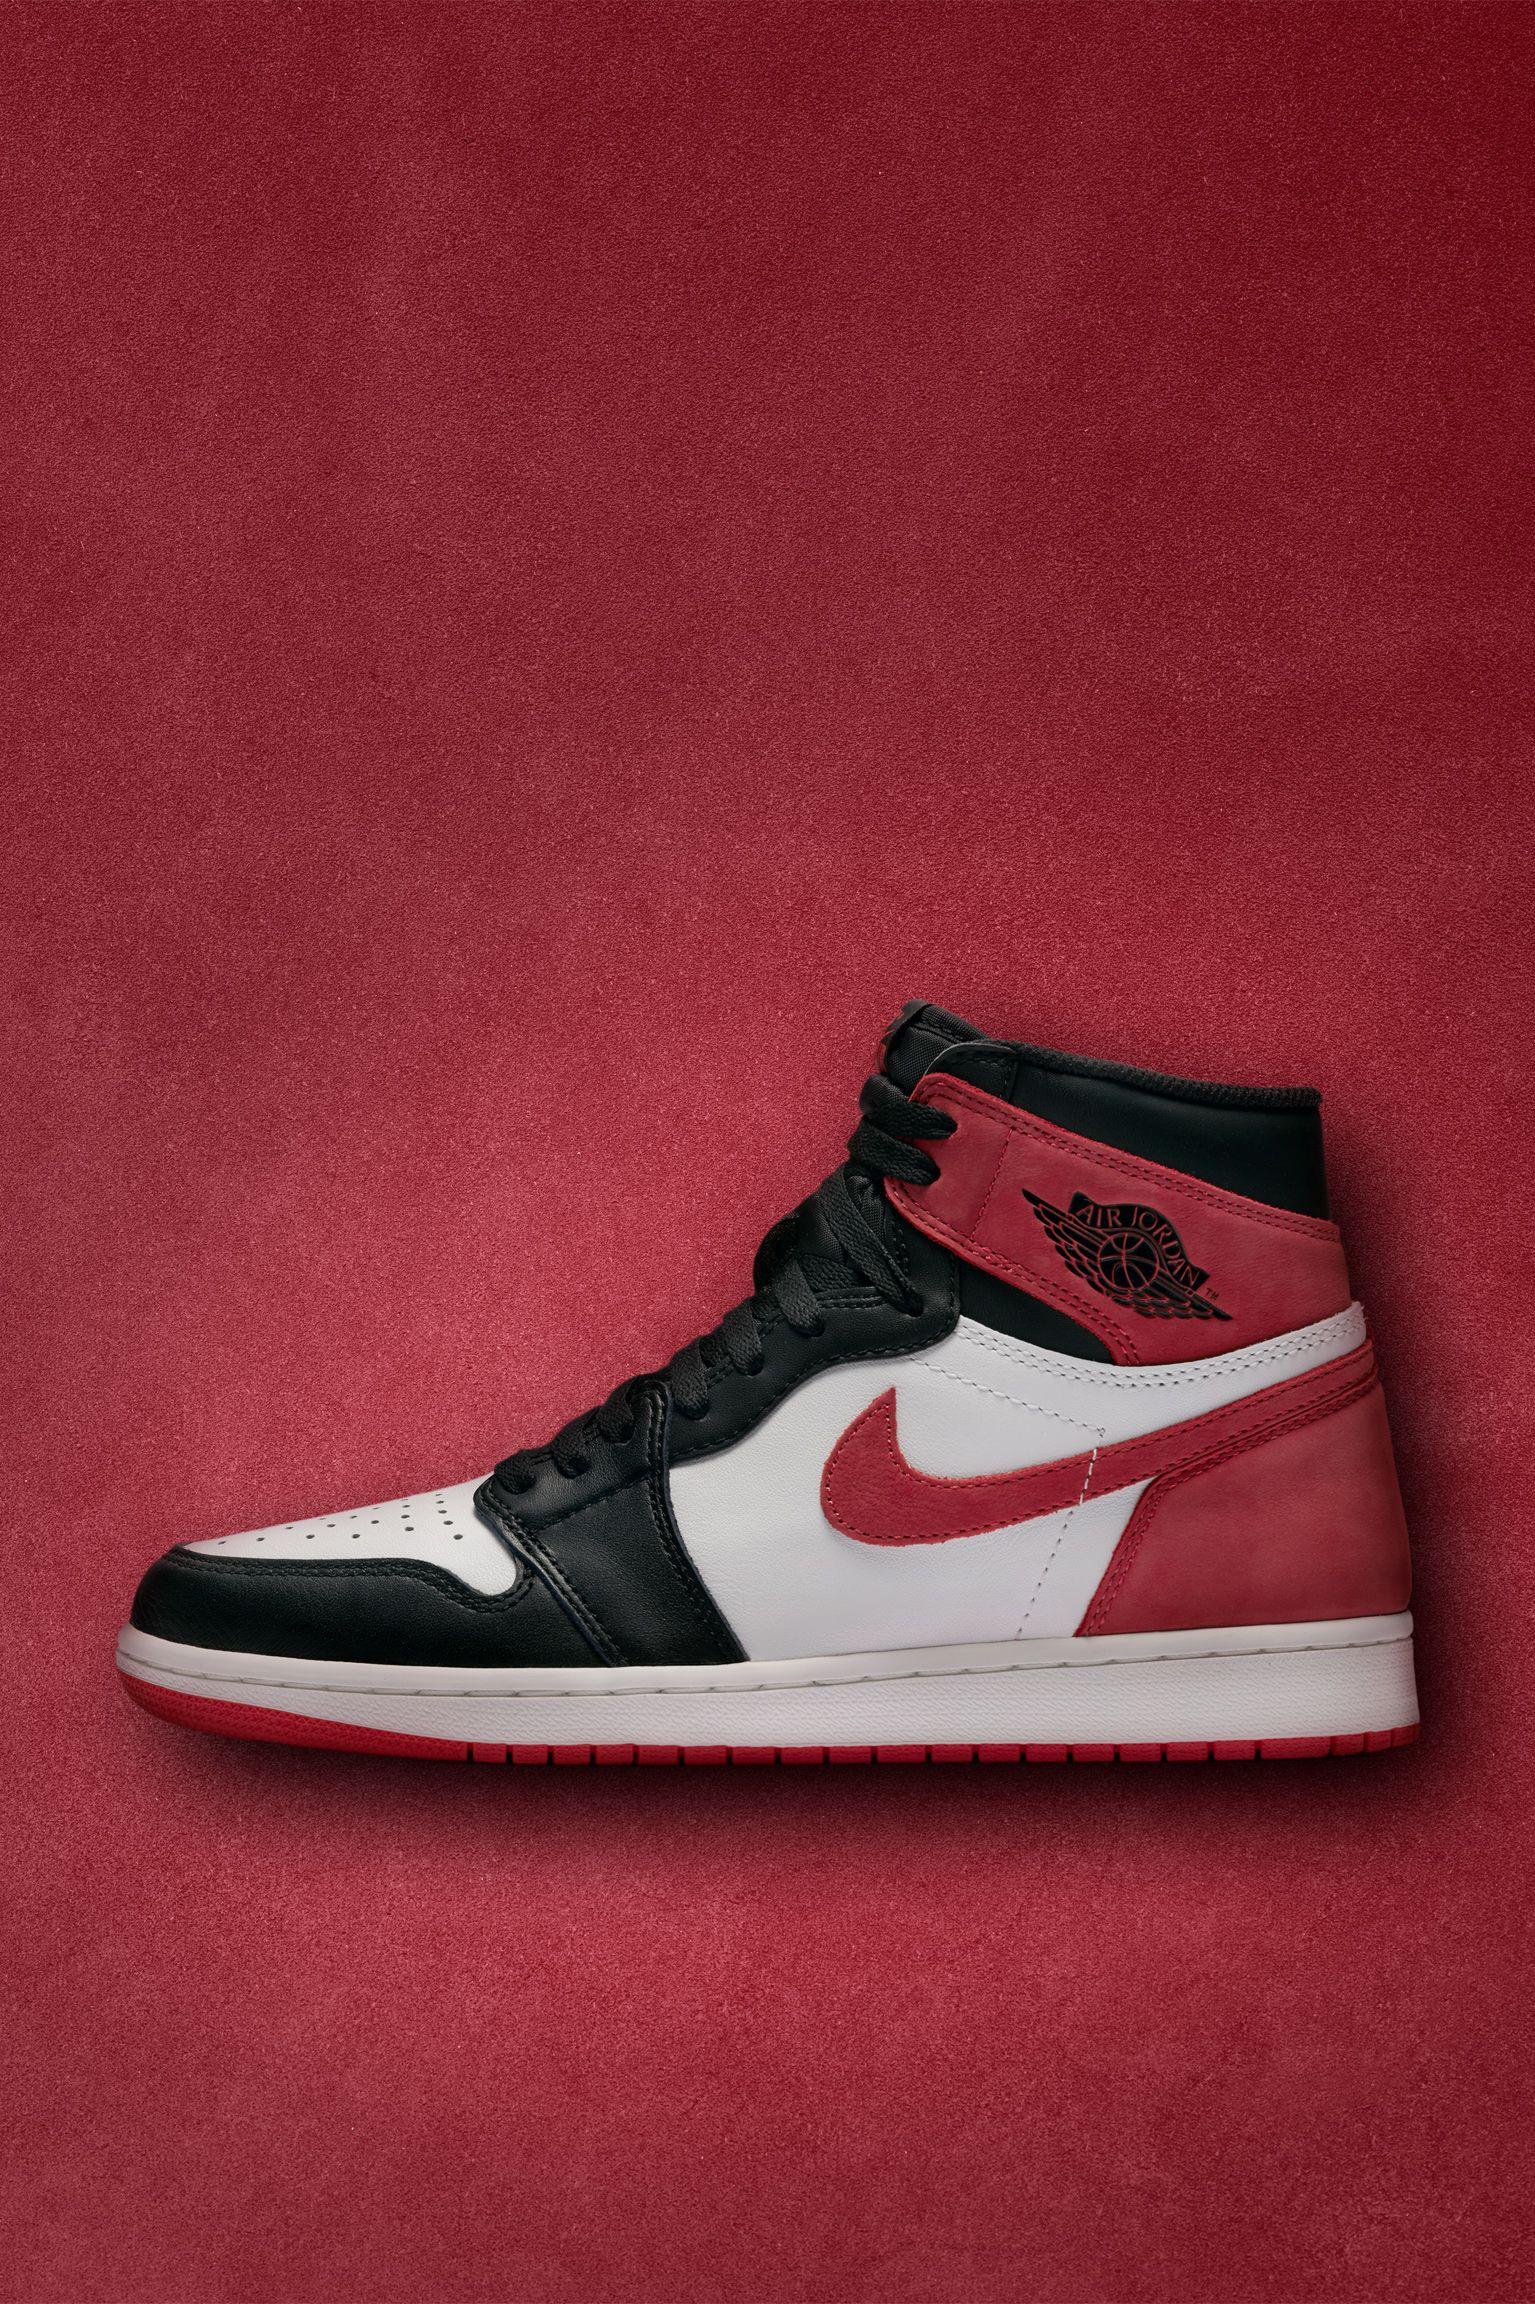 Nike Air Jordan 1 'Summit White &Track Red & Black' Release Date ...